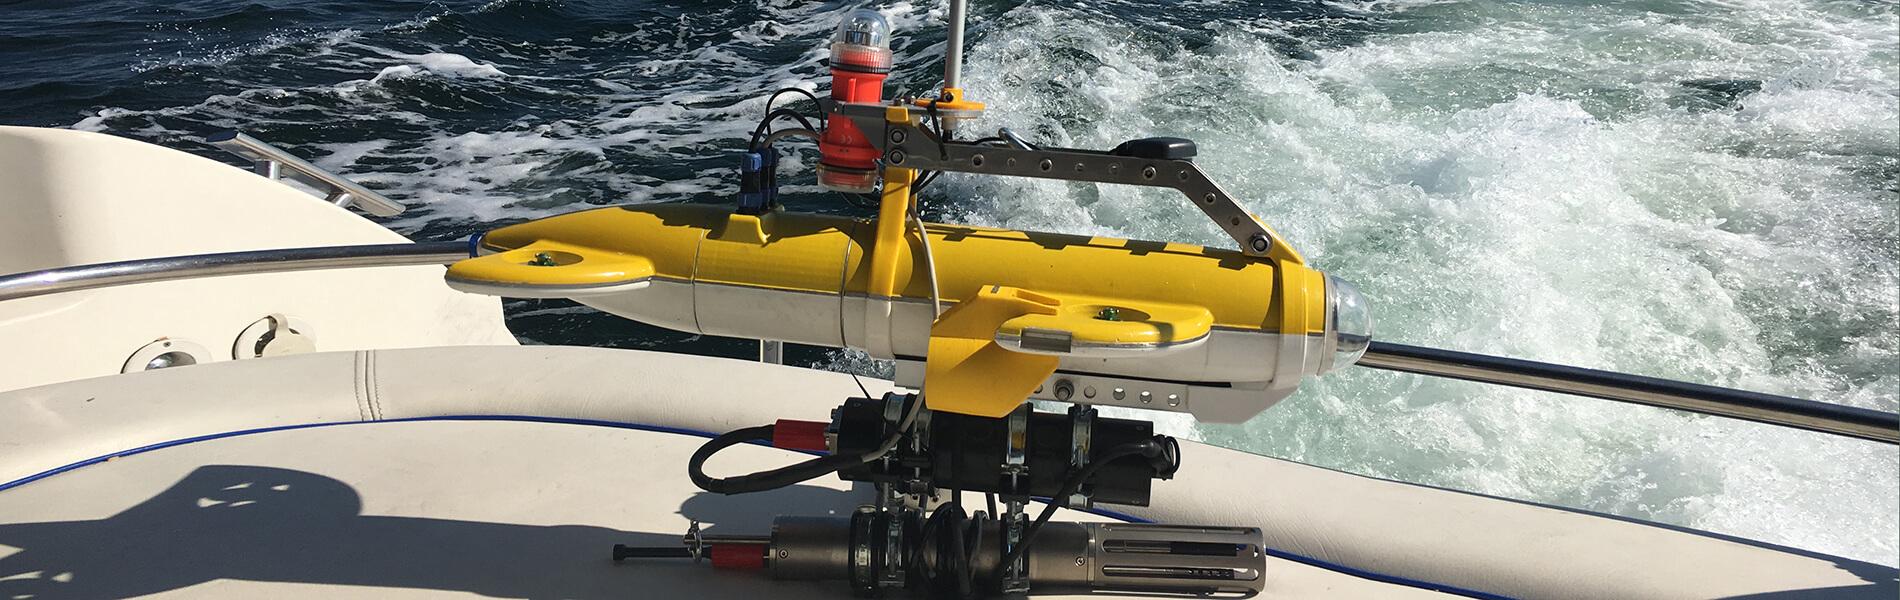 Underwater swarming: Autonomous underwater robots